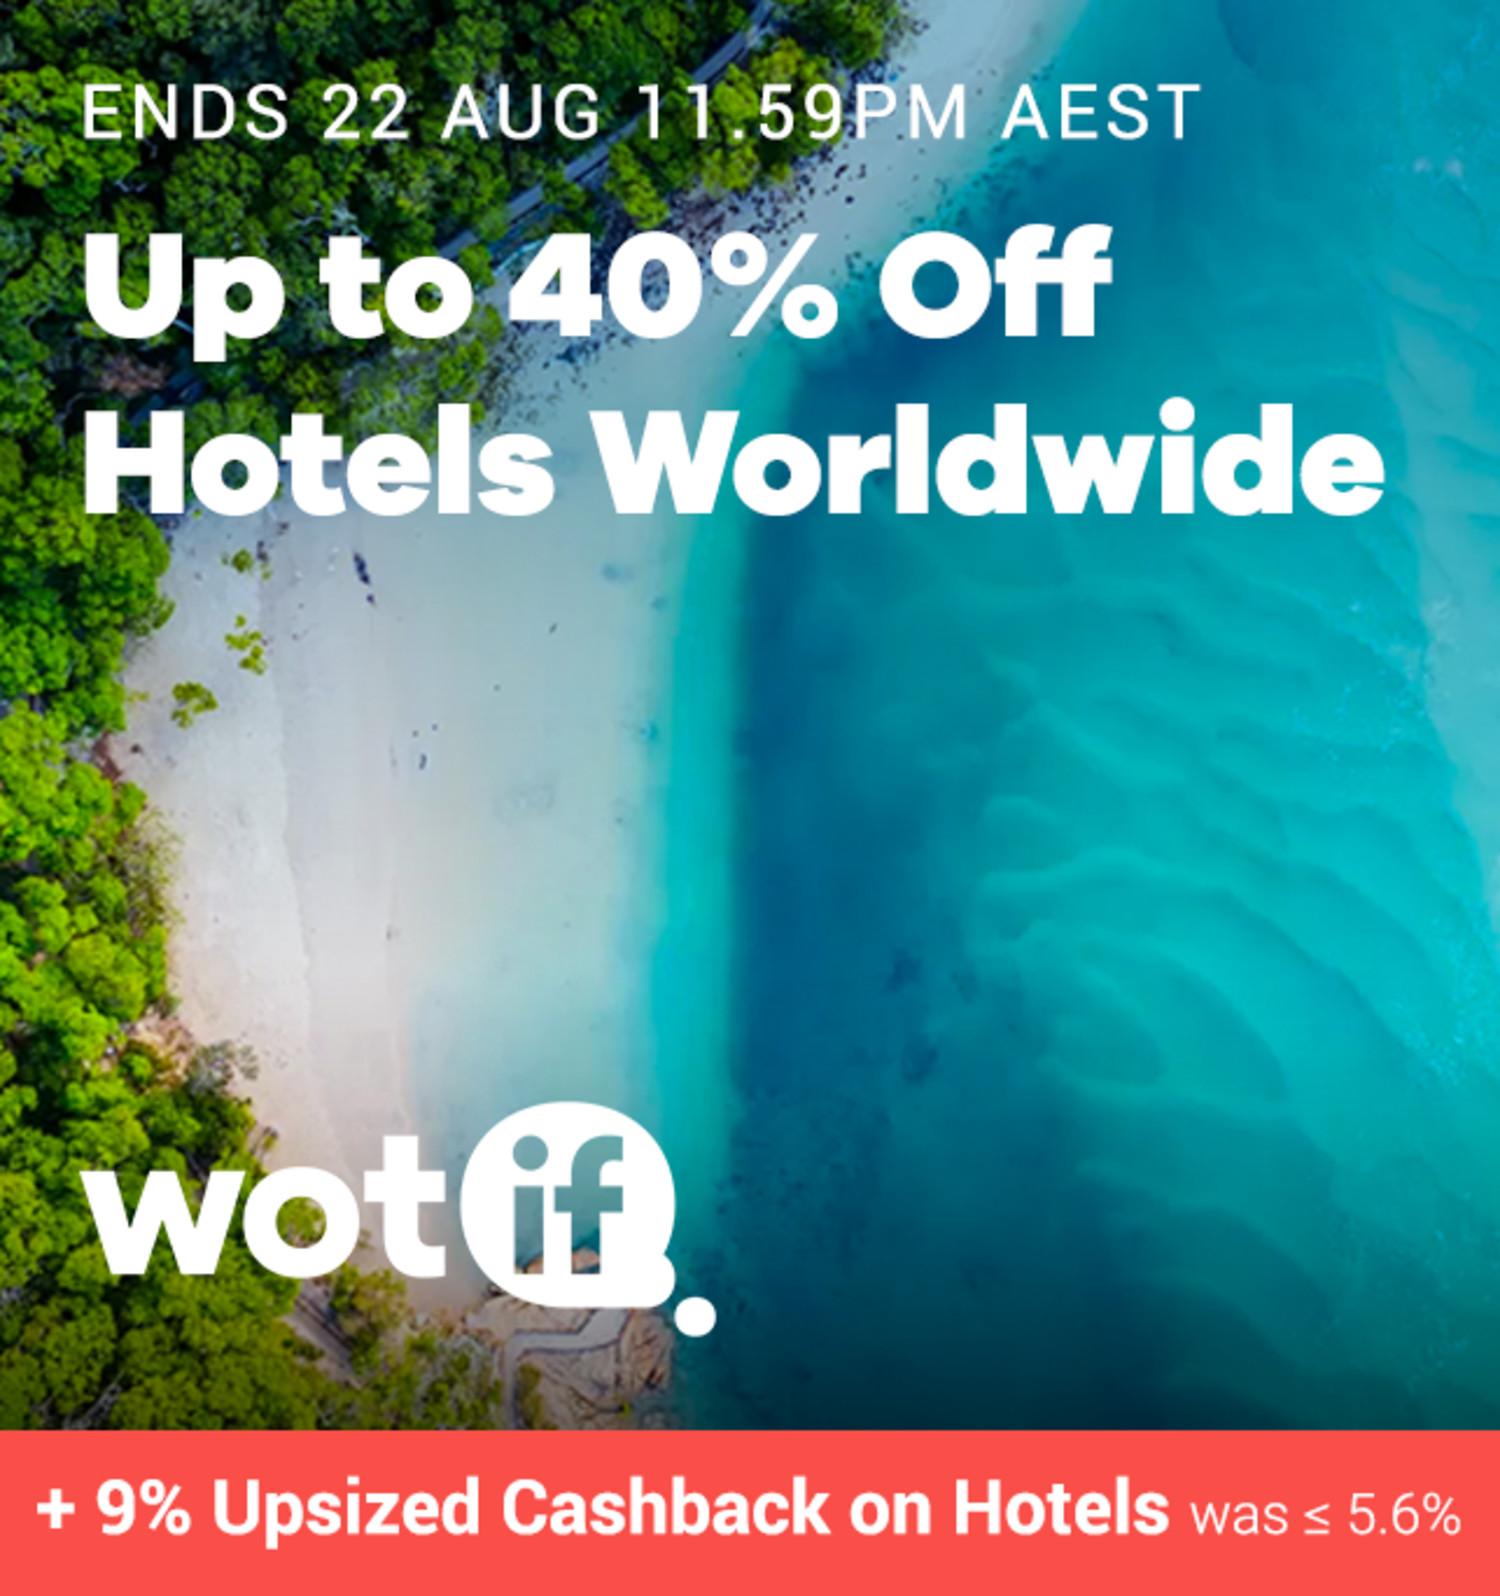 Wotif - 9% Upsized Cashback on Hotels